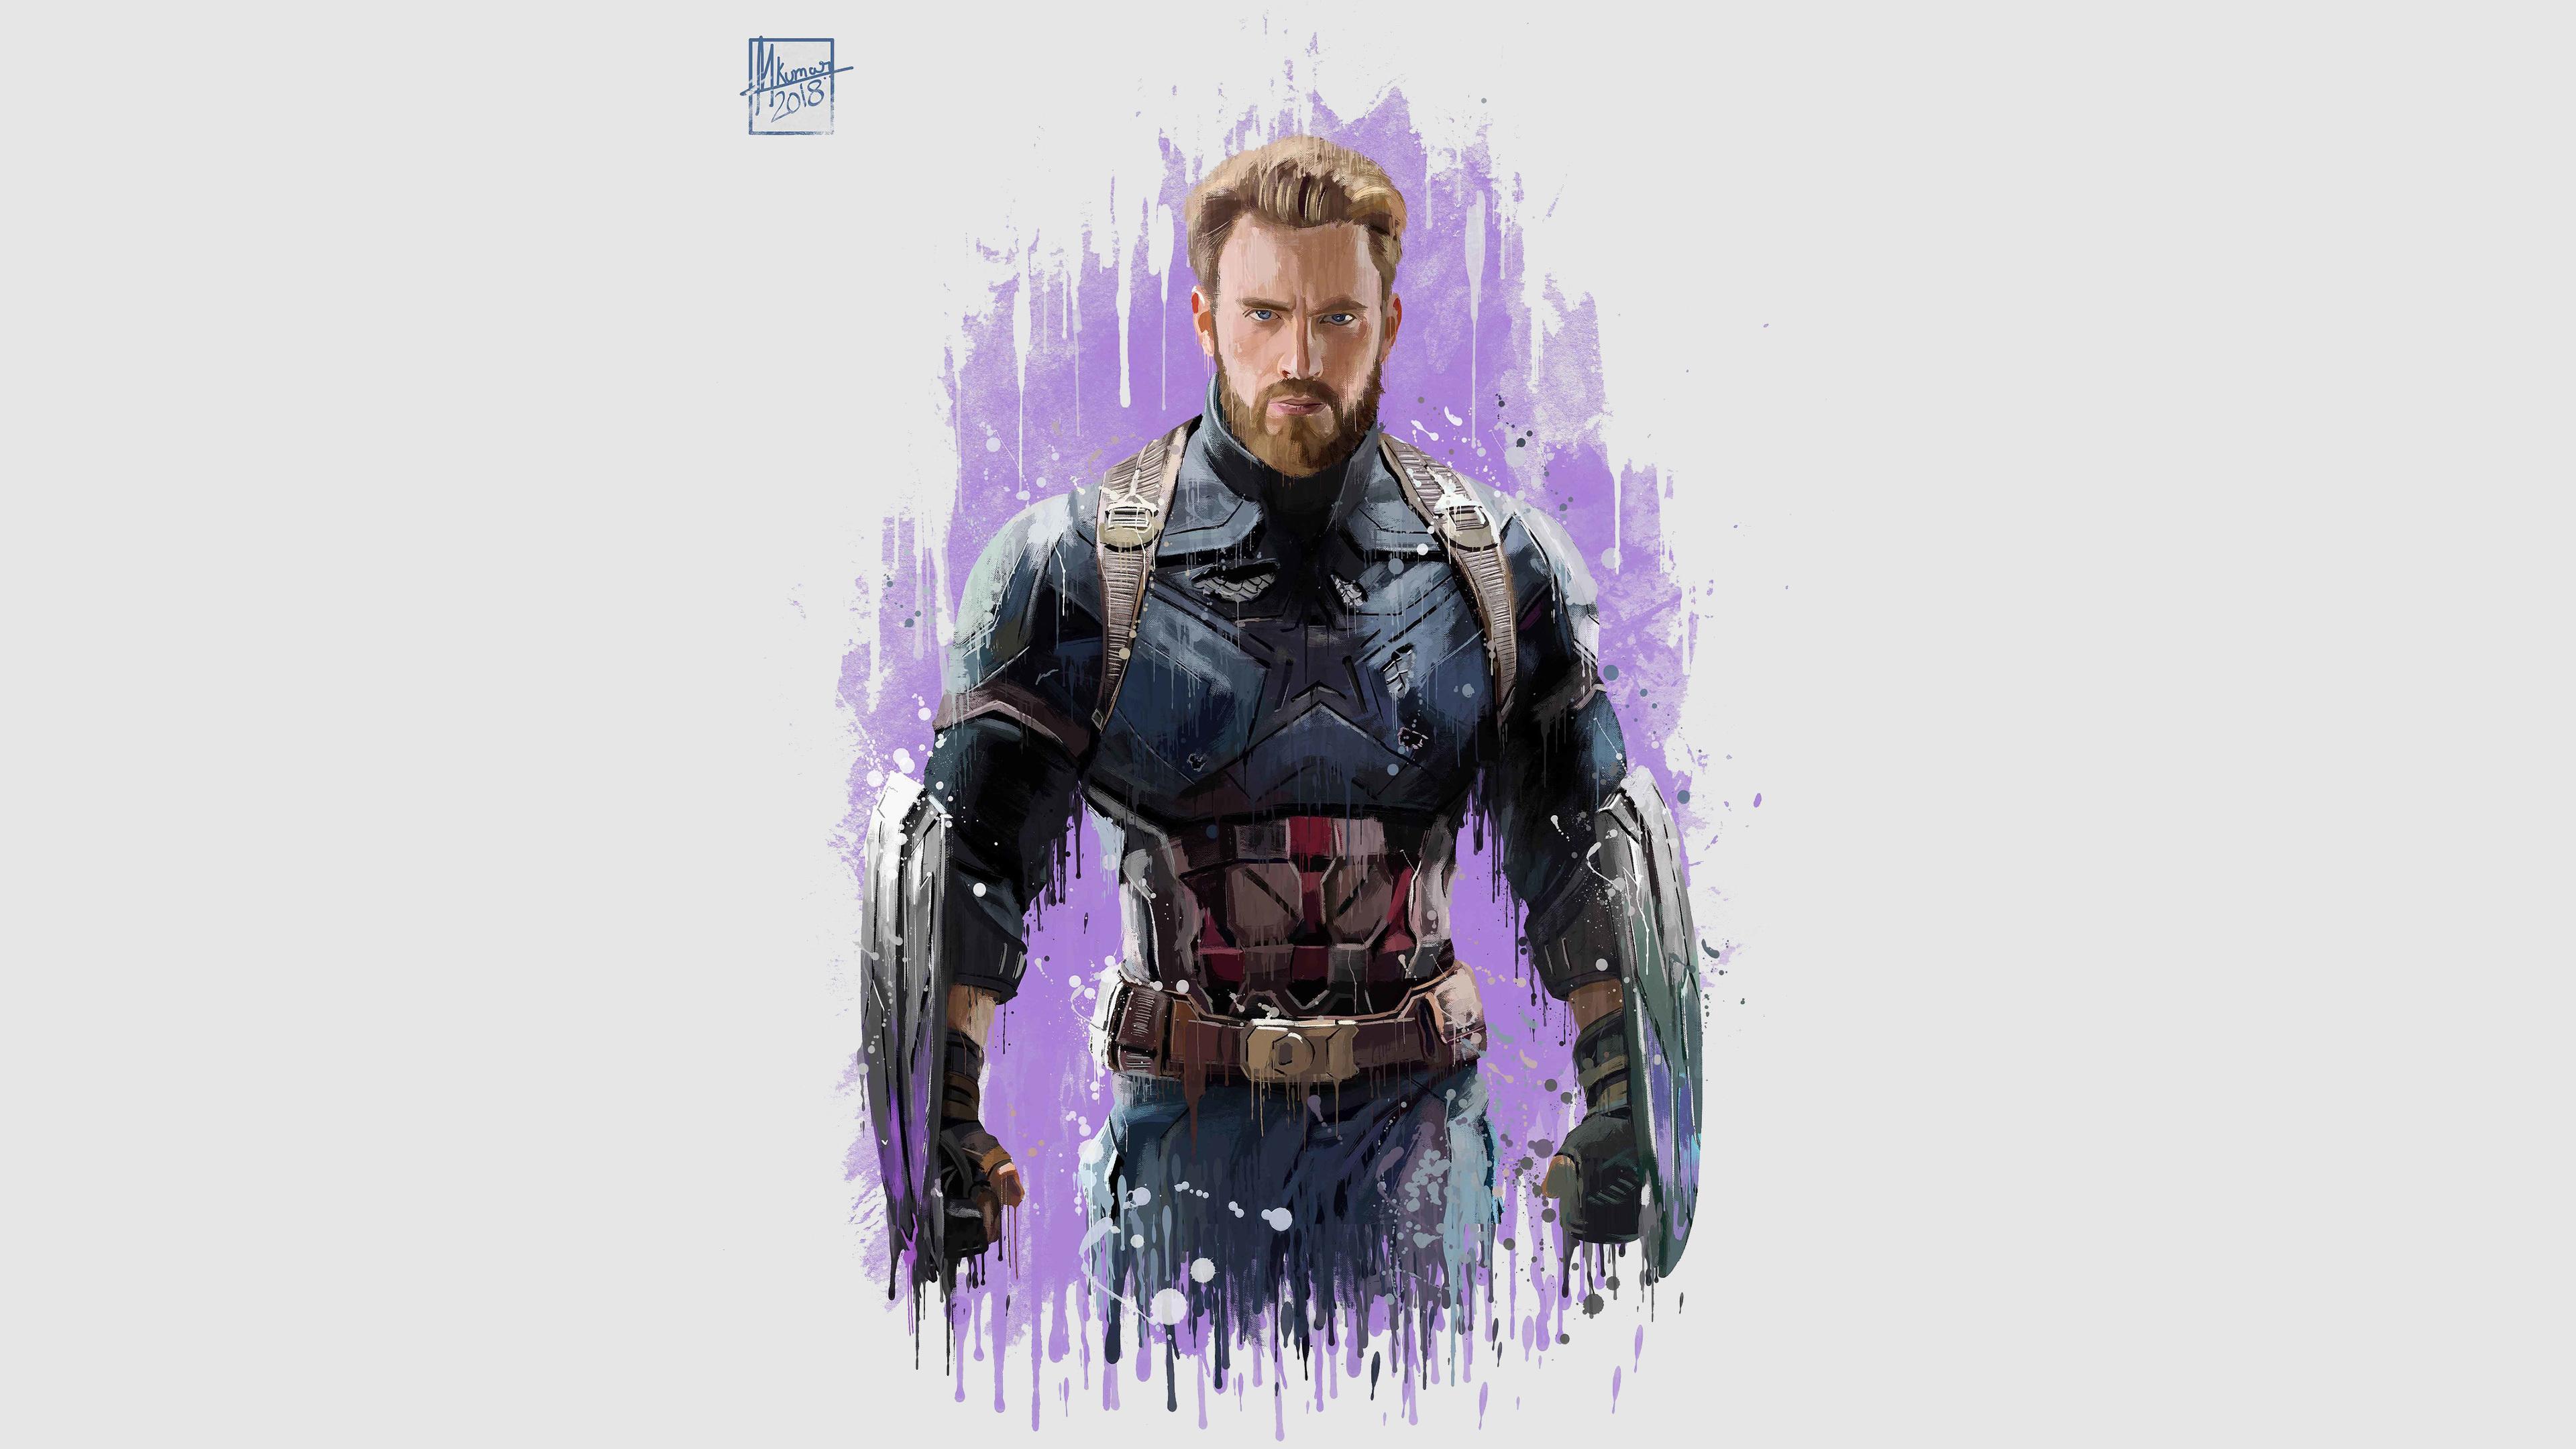 Download 3840x2400 Wallpaper Captain America Avengers